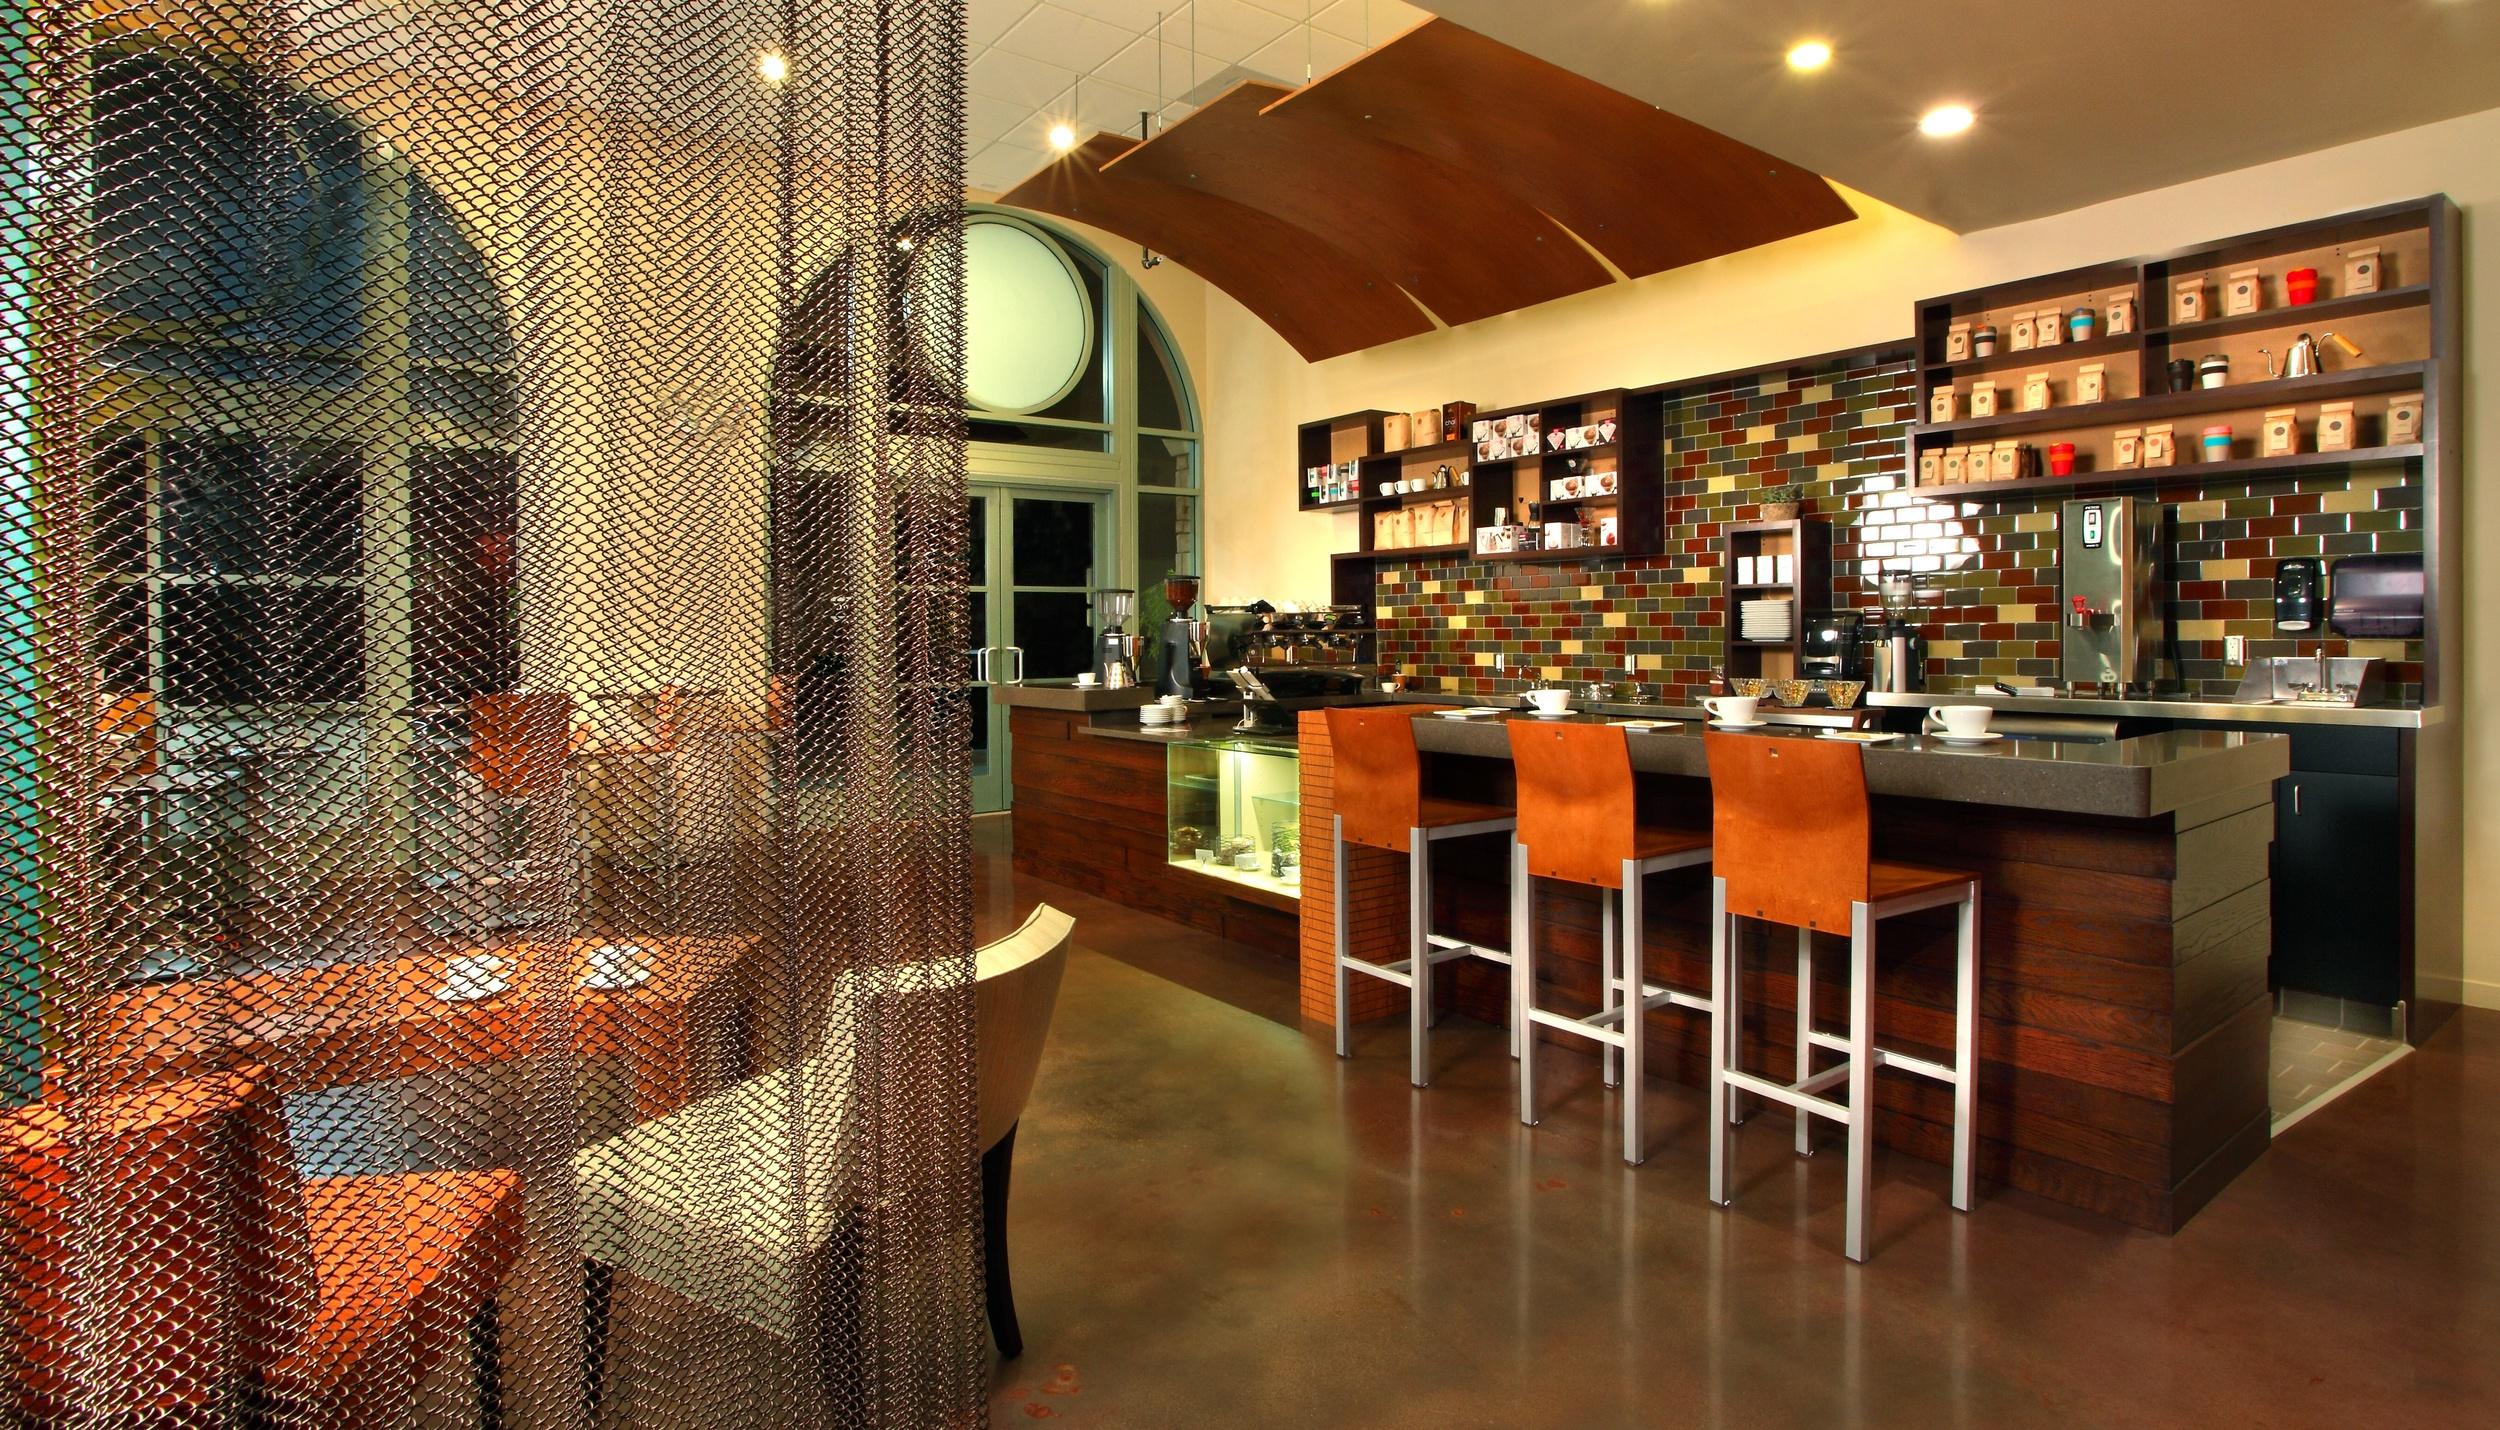 Cafe Design Architecture Cafe Design Architecture Cafe Design Architecture